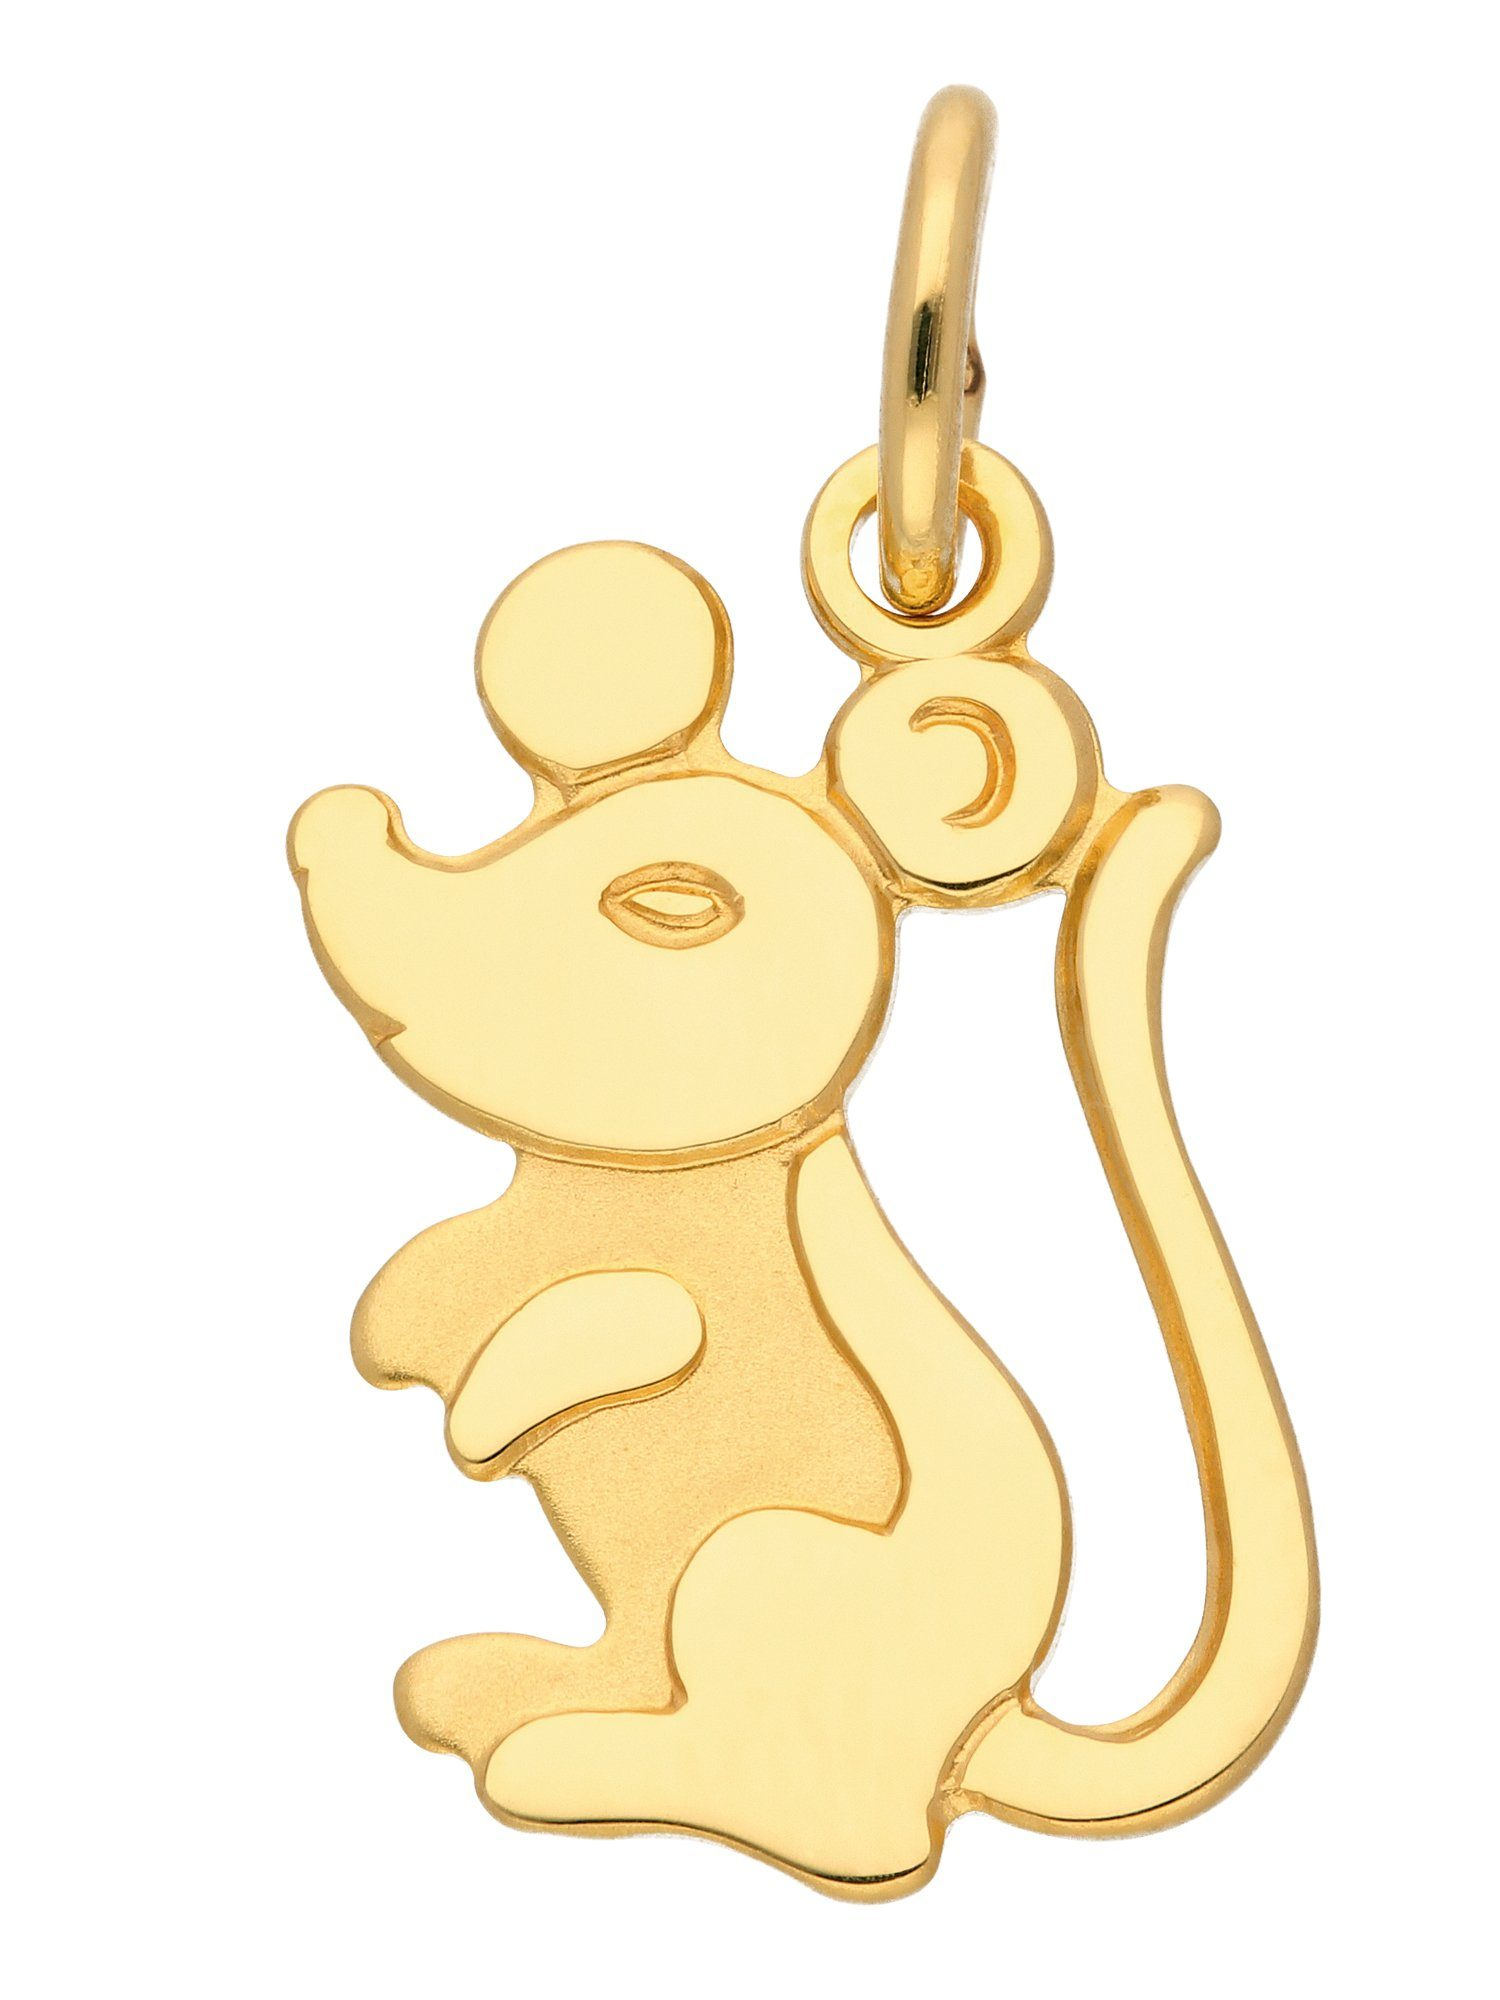 Adelia´s Kettenanhänger »Gold Anhänger« Maus 8 k 333 Gelbgold